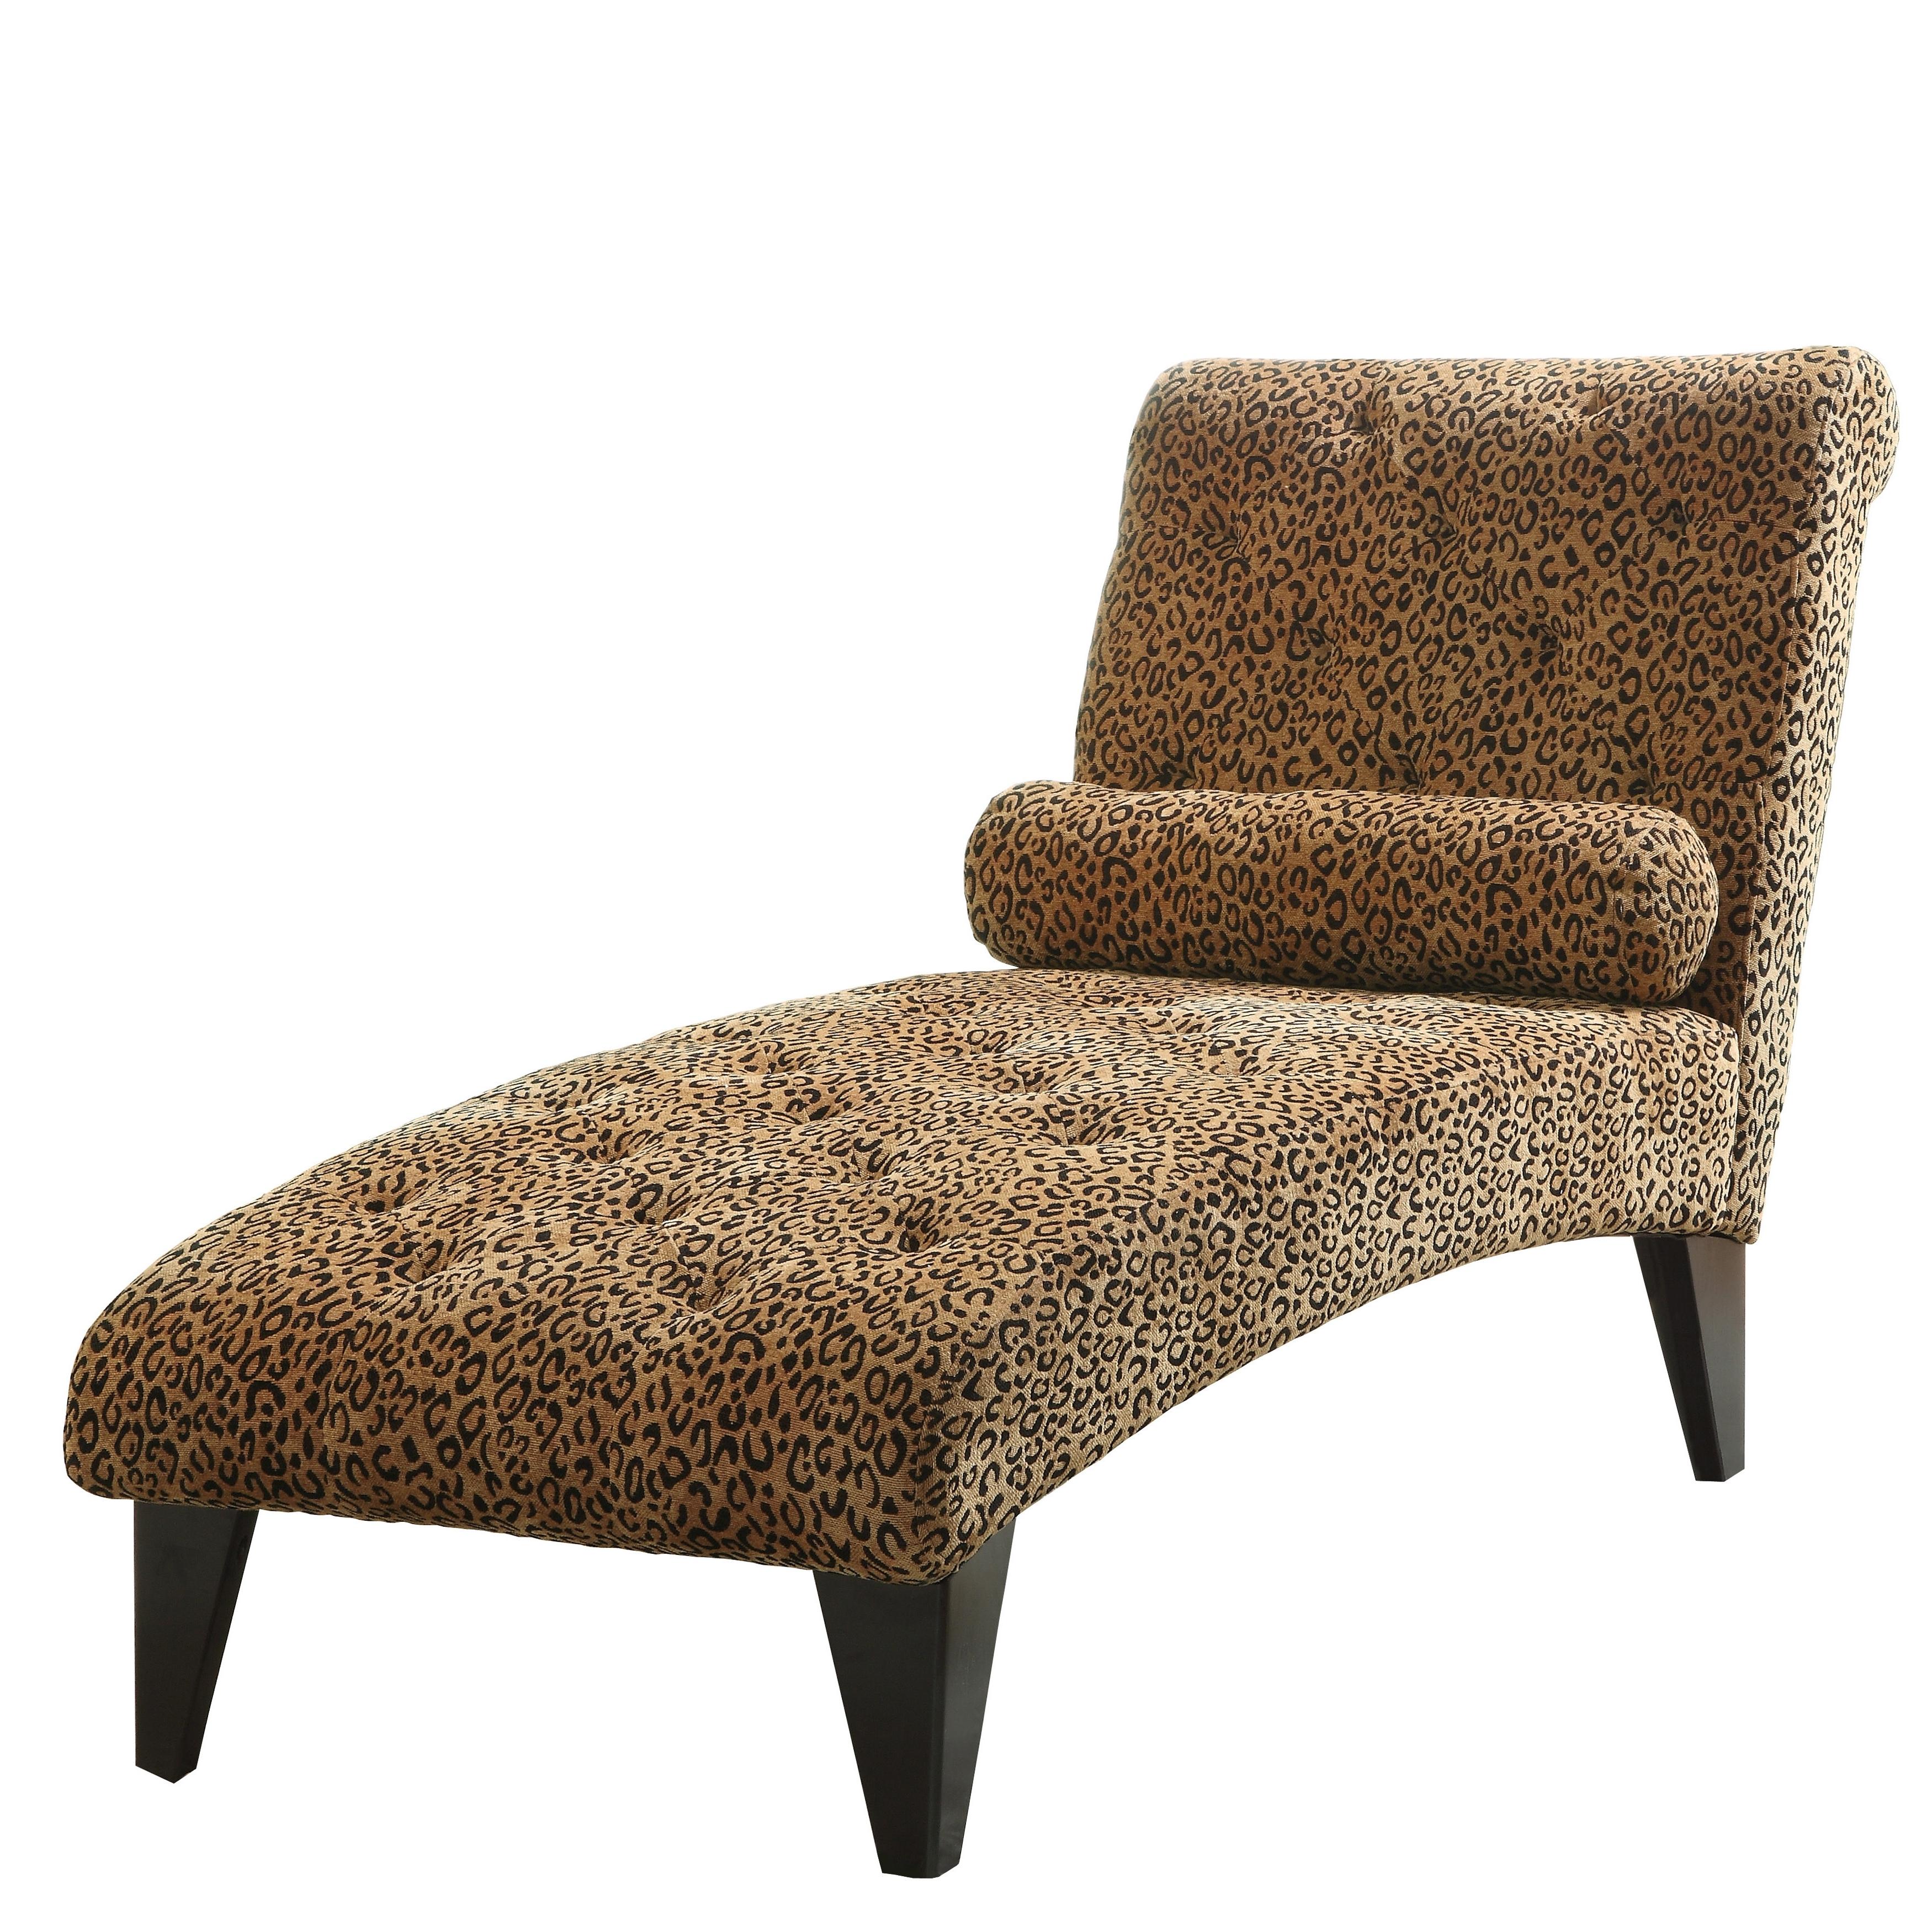 Coaster Leopard Print Chaise Lounge Chair – Walmart In 2017 Leopard Print Chaise Lounges (View 2 of 15)